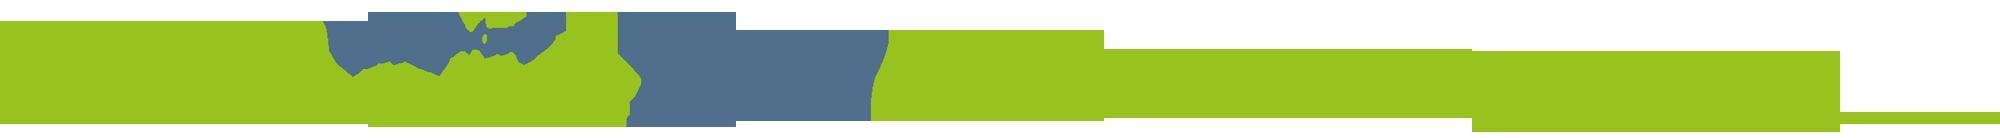 Baugeois Vallée 100% création d'entreprise